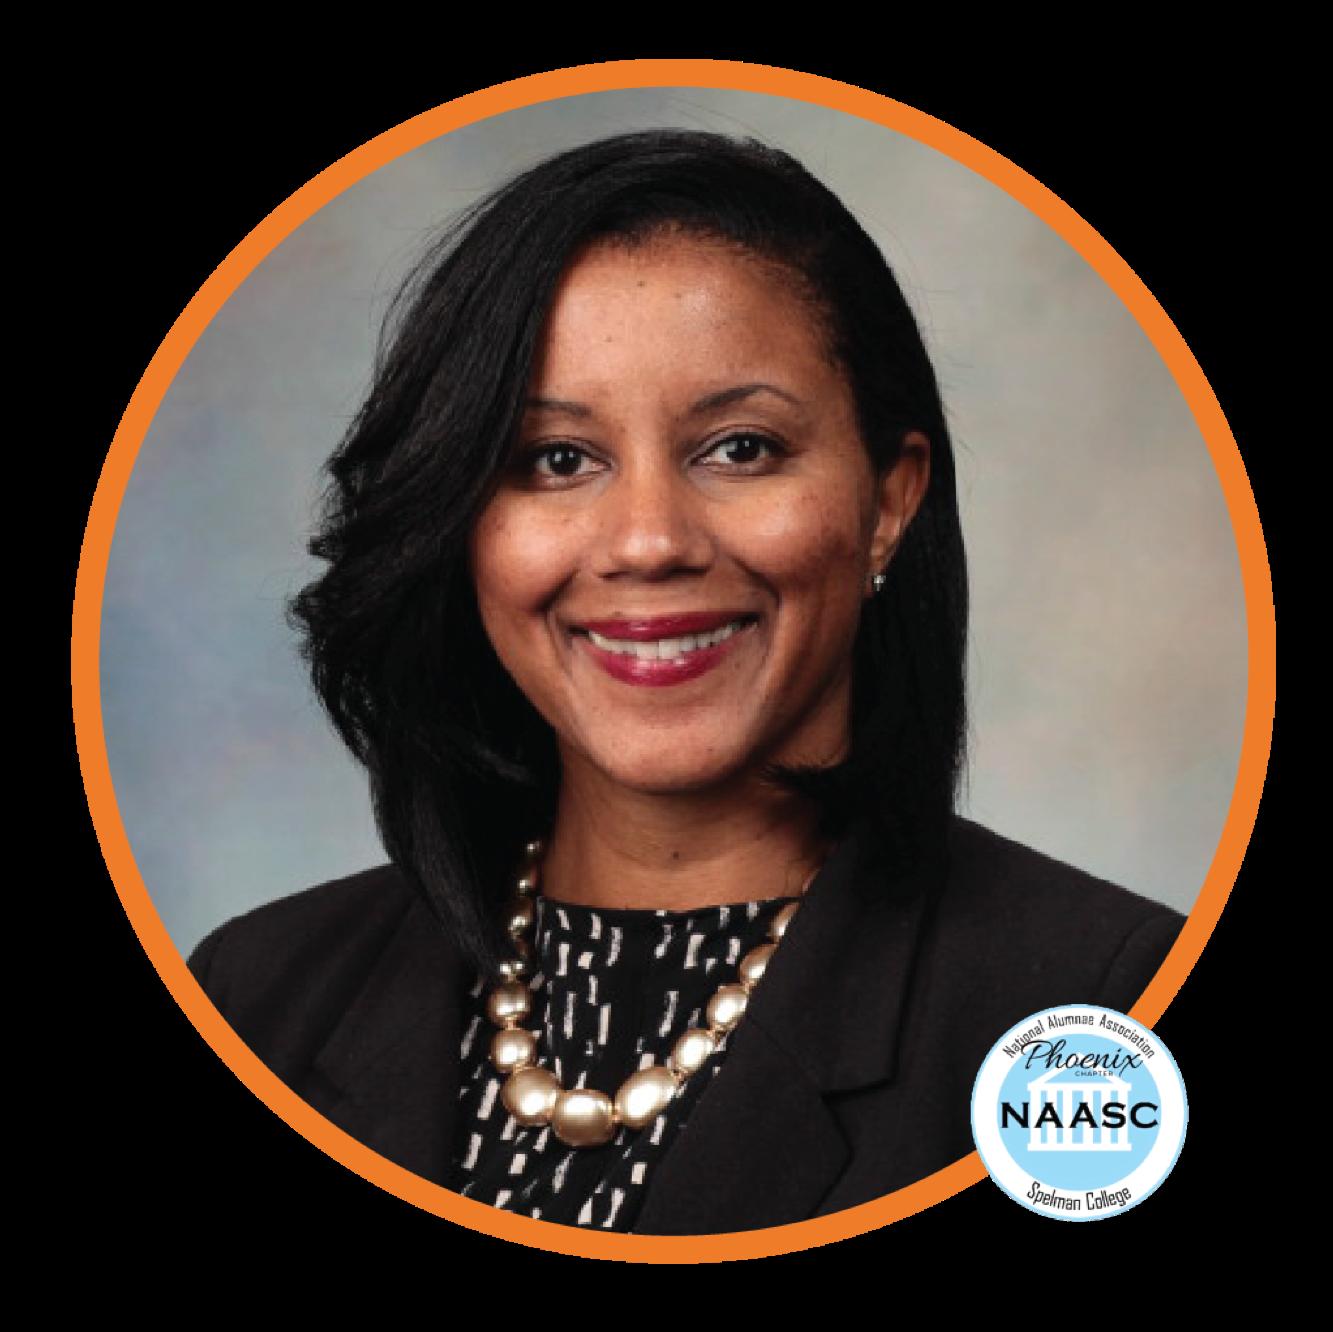 Dr. Alyx B. Porter Umphrey, Alumna